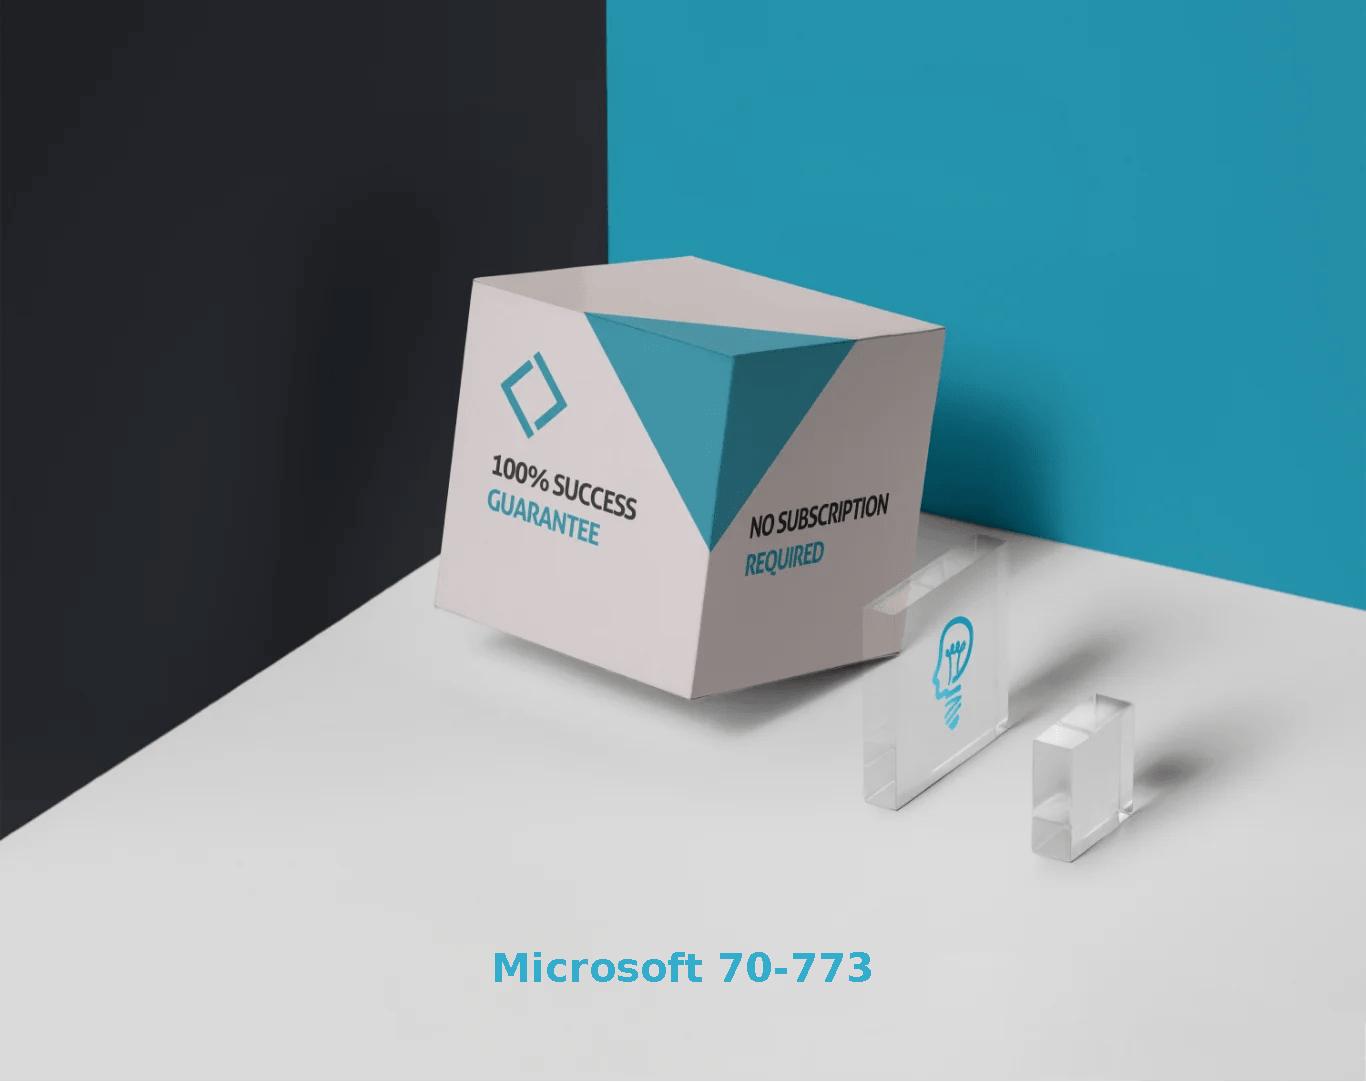 Microsoft 70-773 Exams